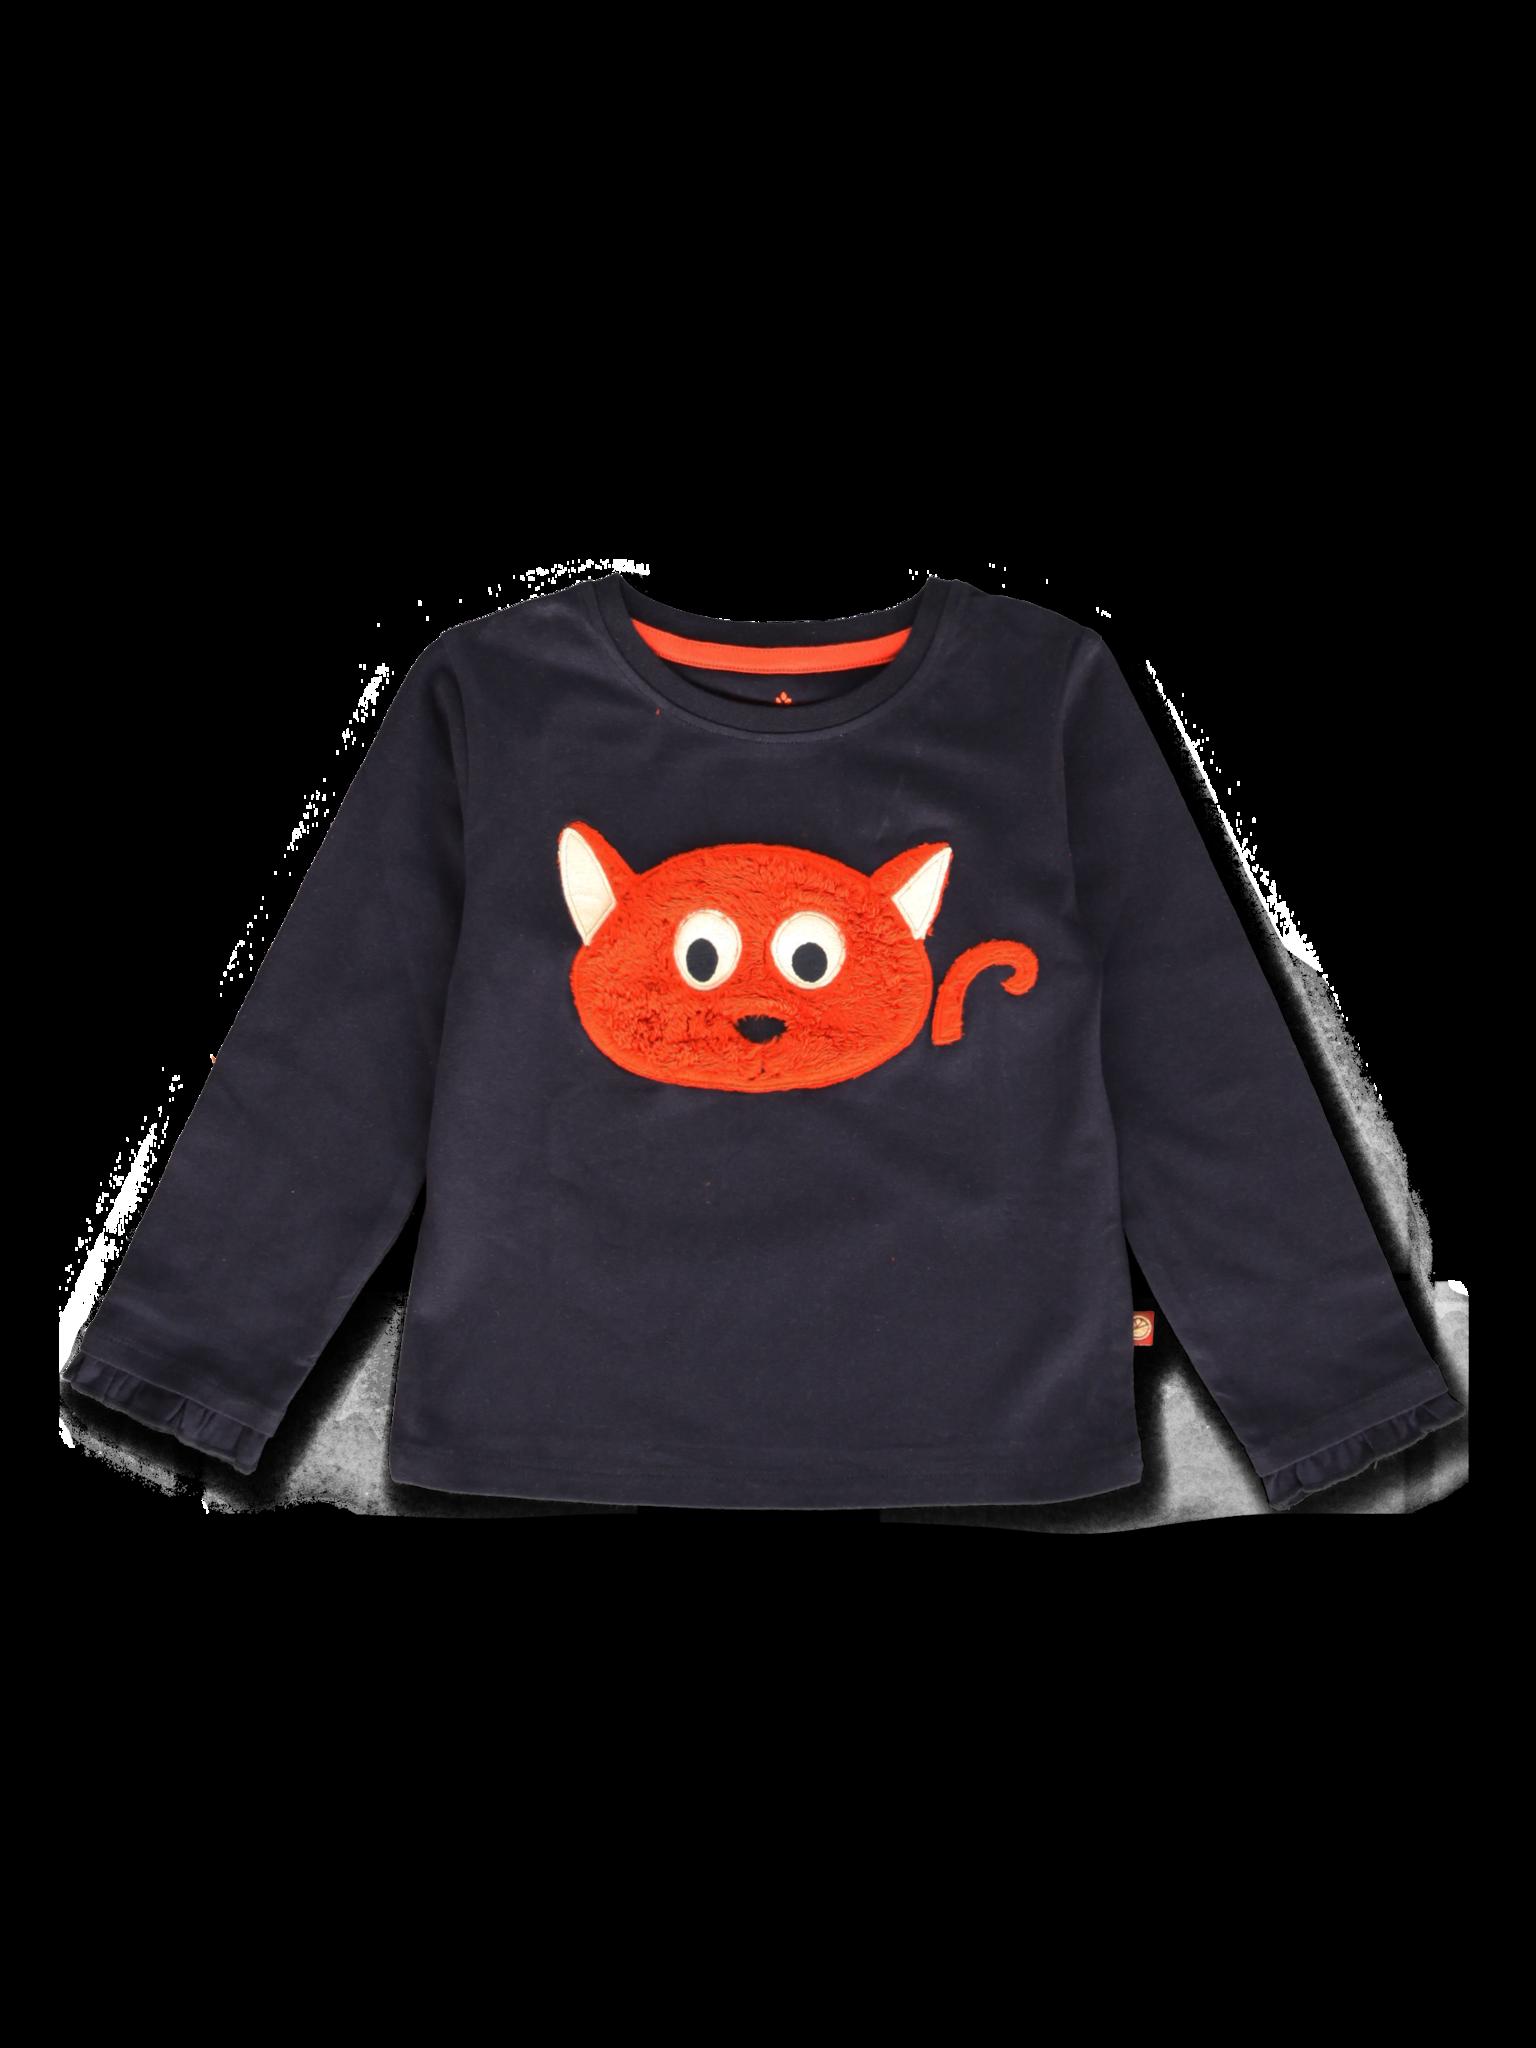 All Brands   Winterproducts Small Girls   T-shirt   12 pcs/box